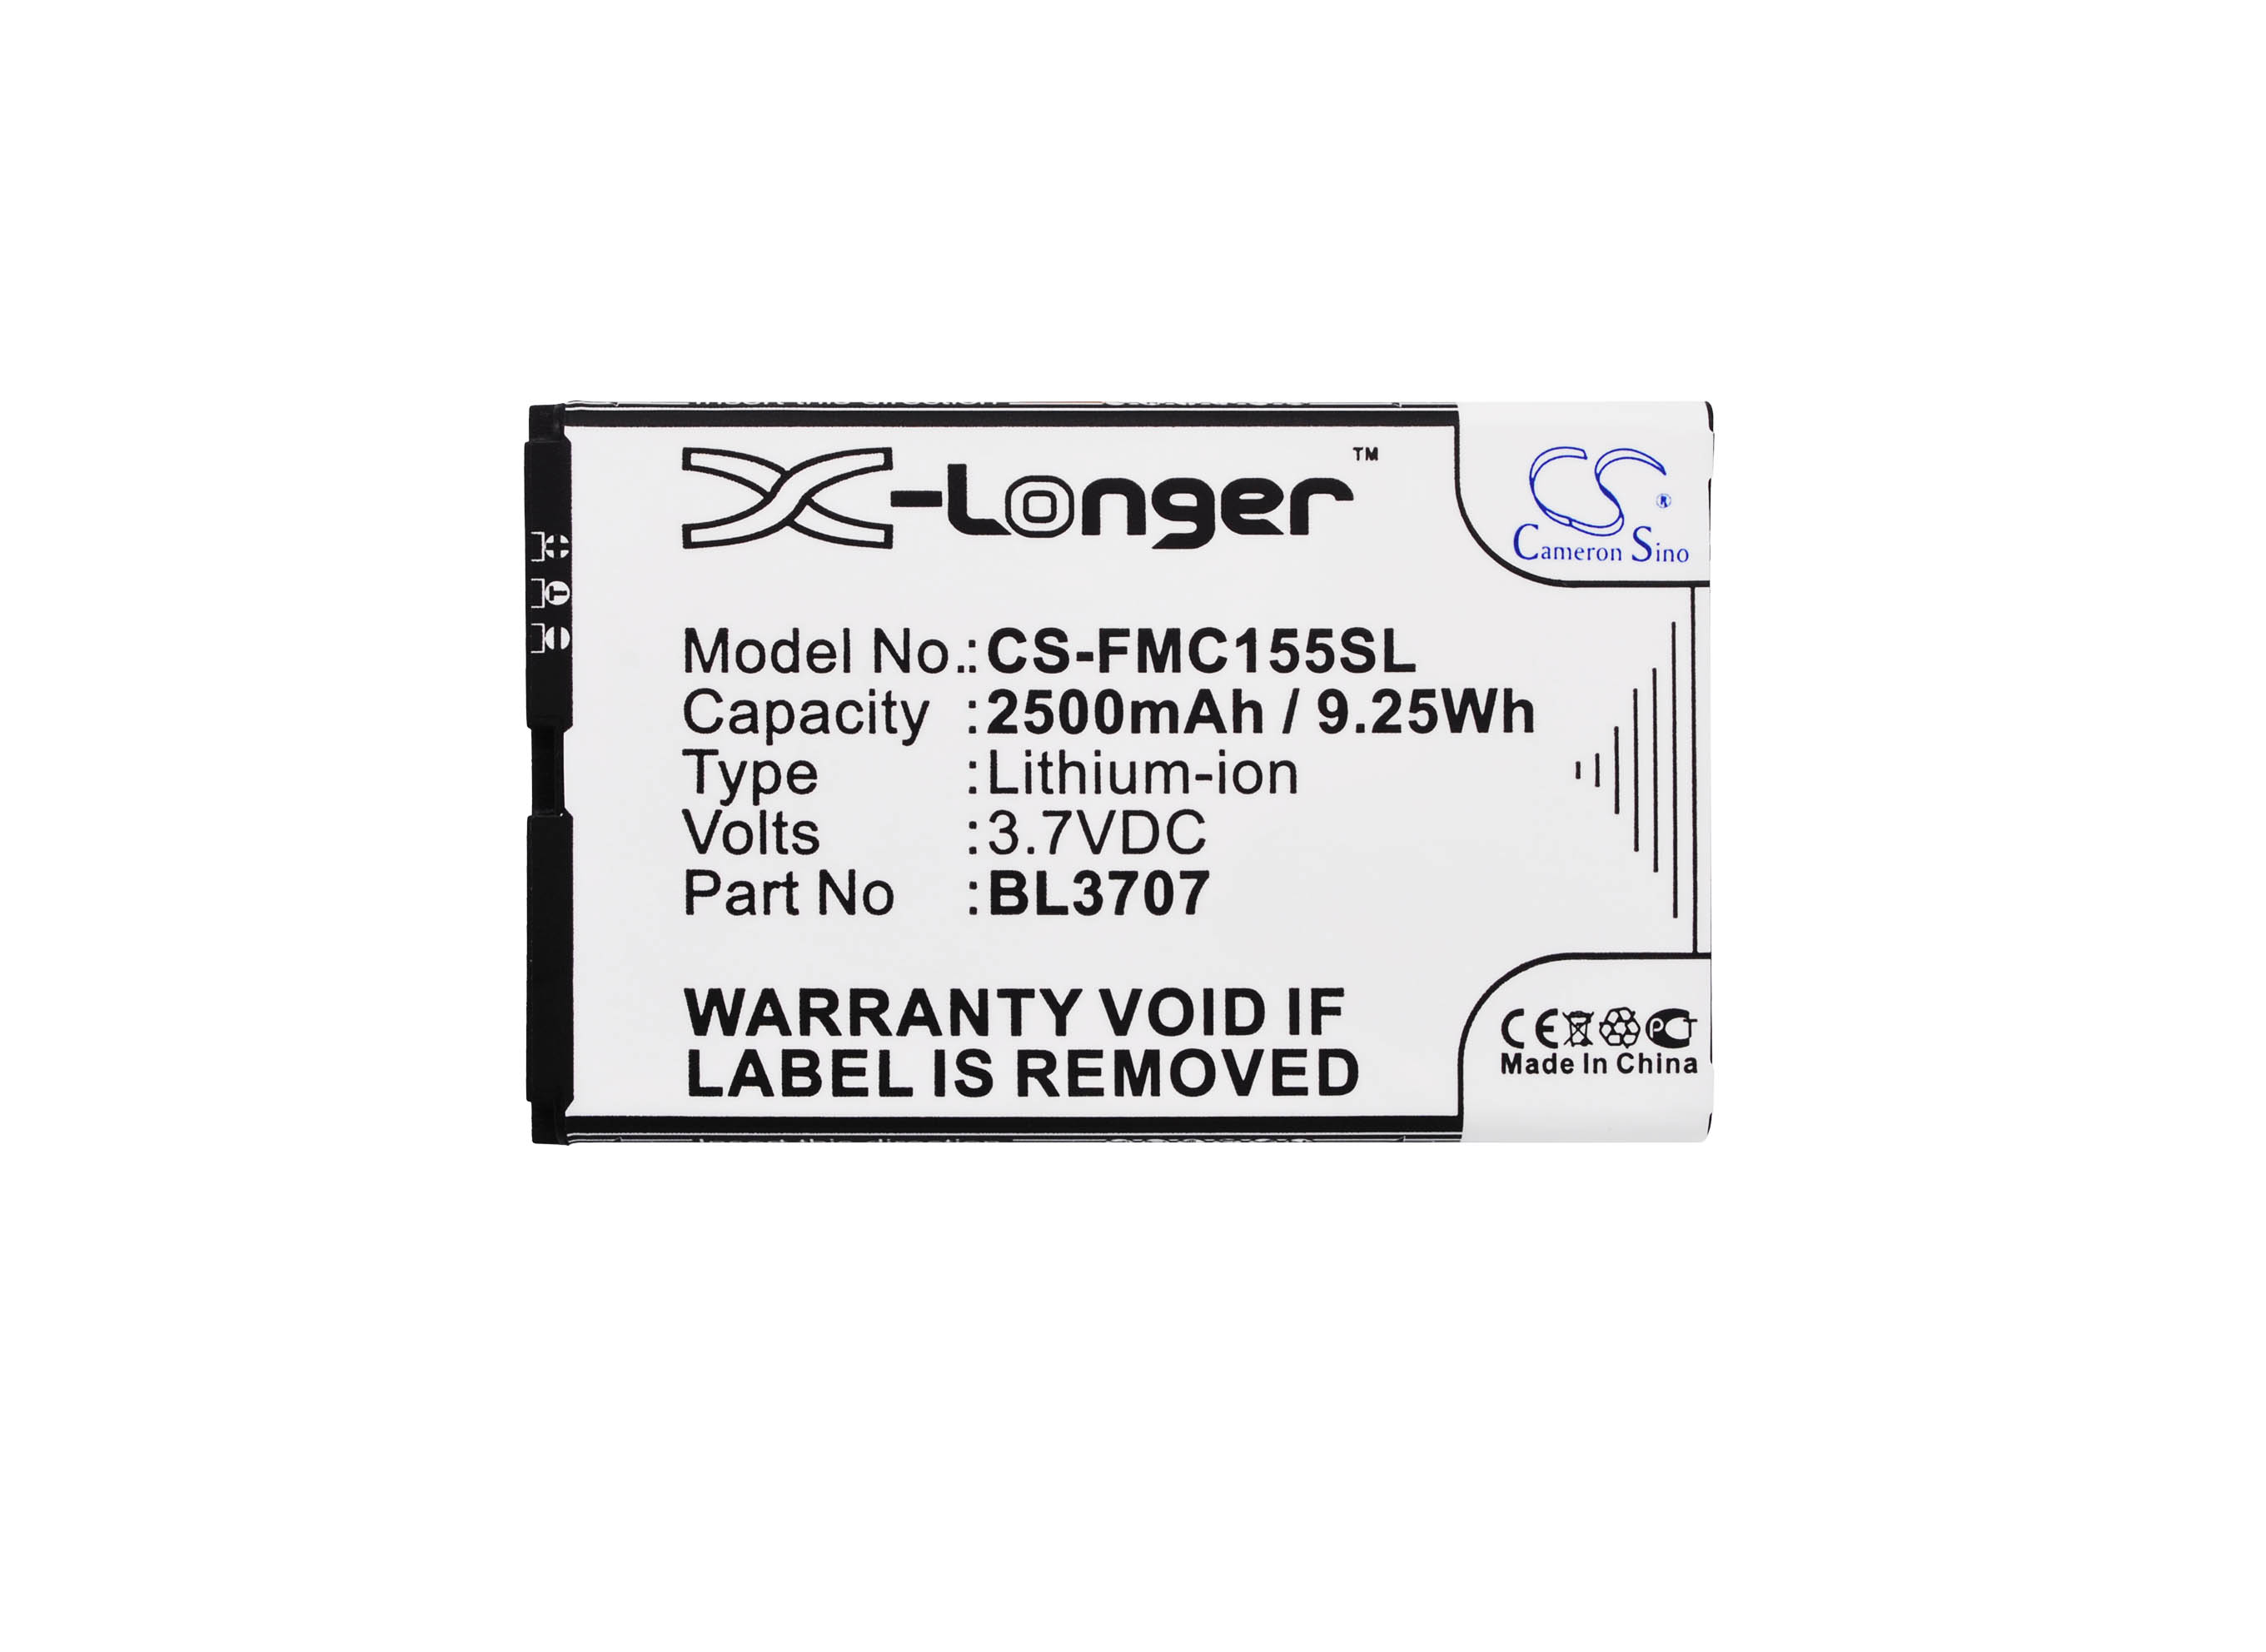 Cameron Sino 2500mAh Battery BL3707 for Fly Era Energy 2, IQ4401, MC155